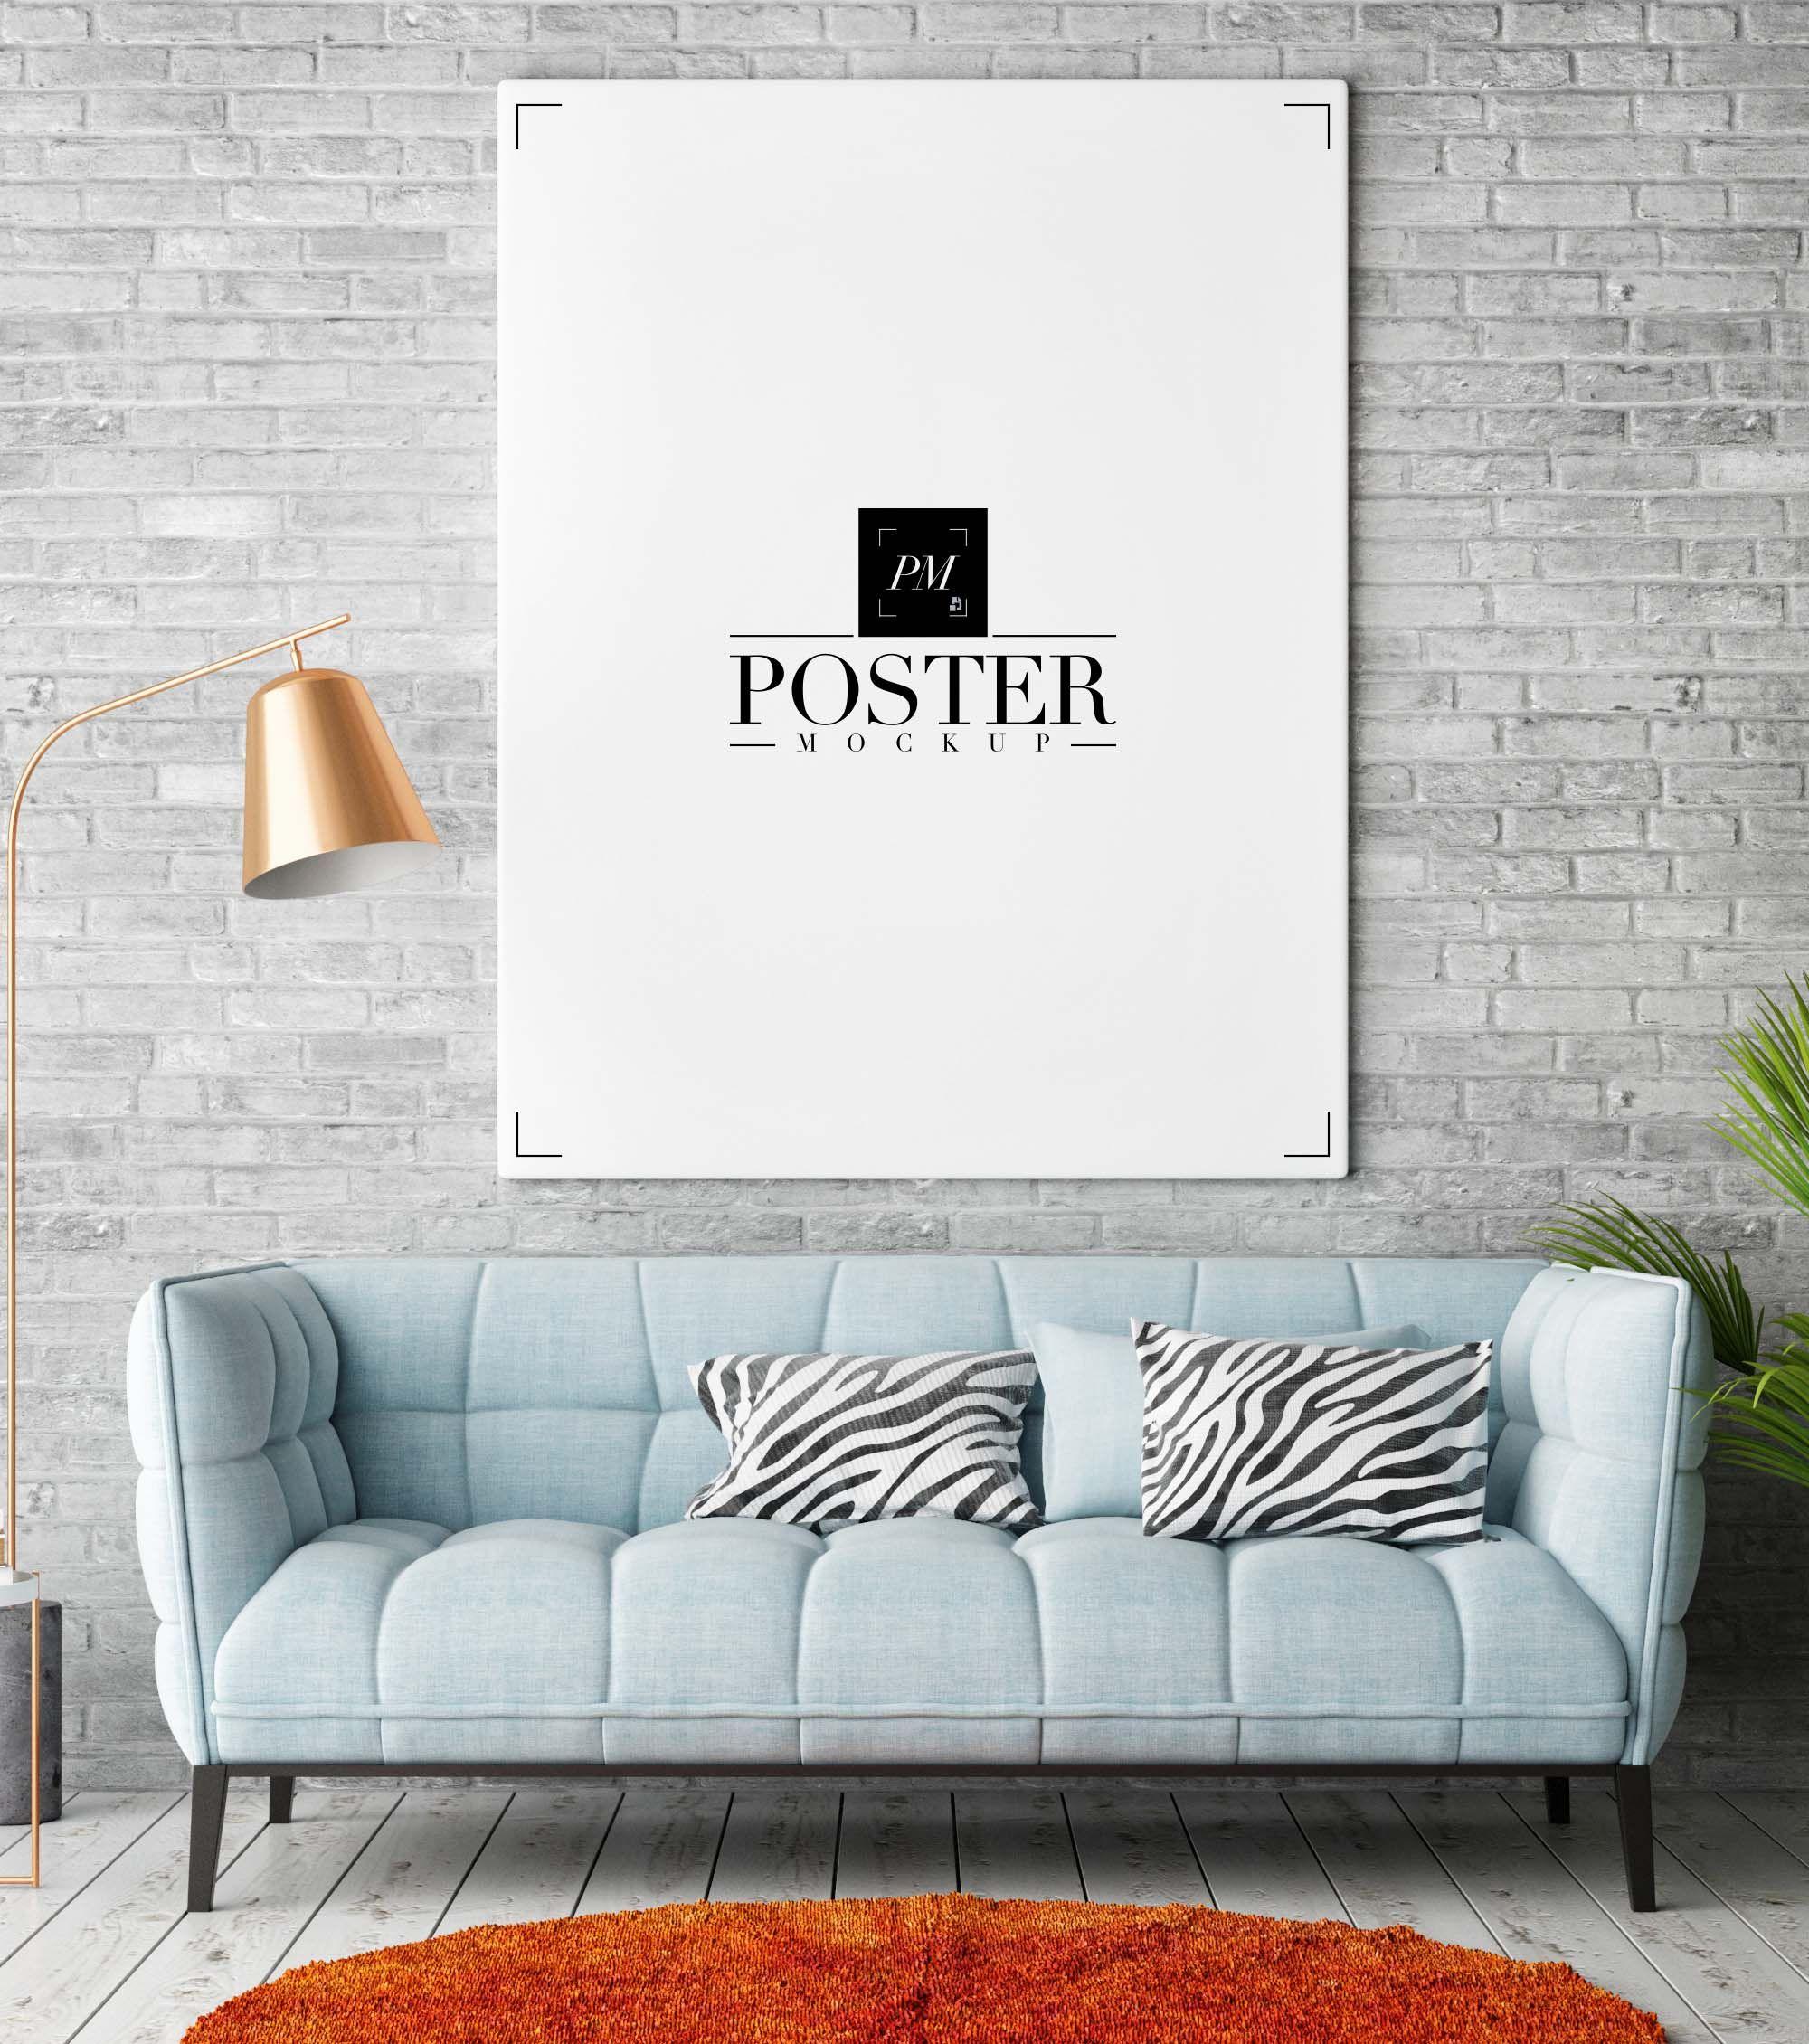 Free Room Interior Poster Mockup Psd Vdohnovenie Zhiznennye